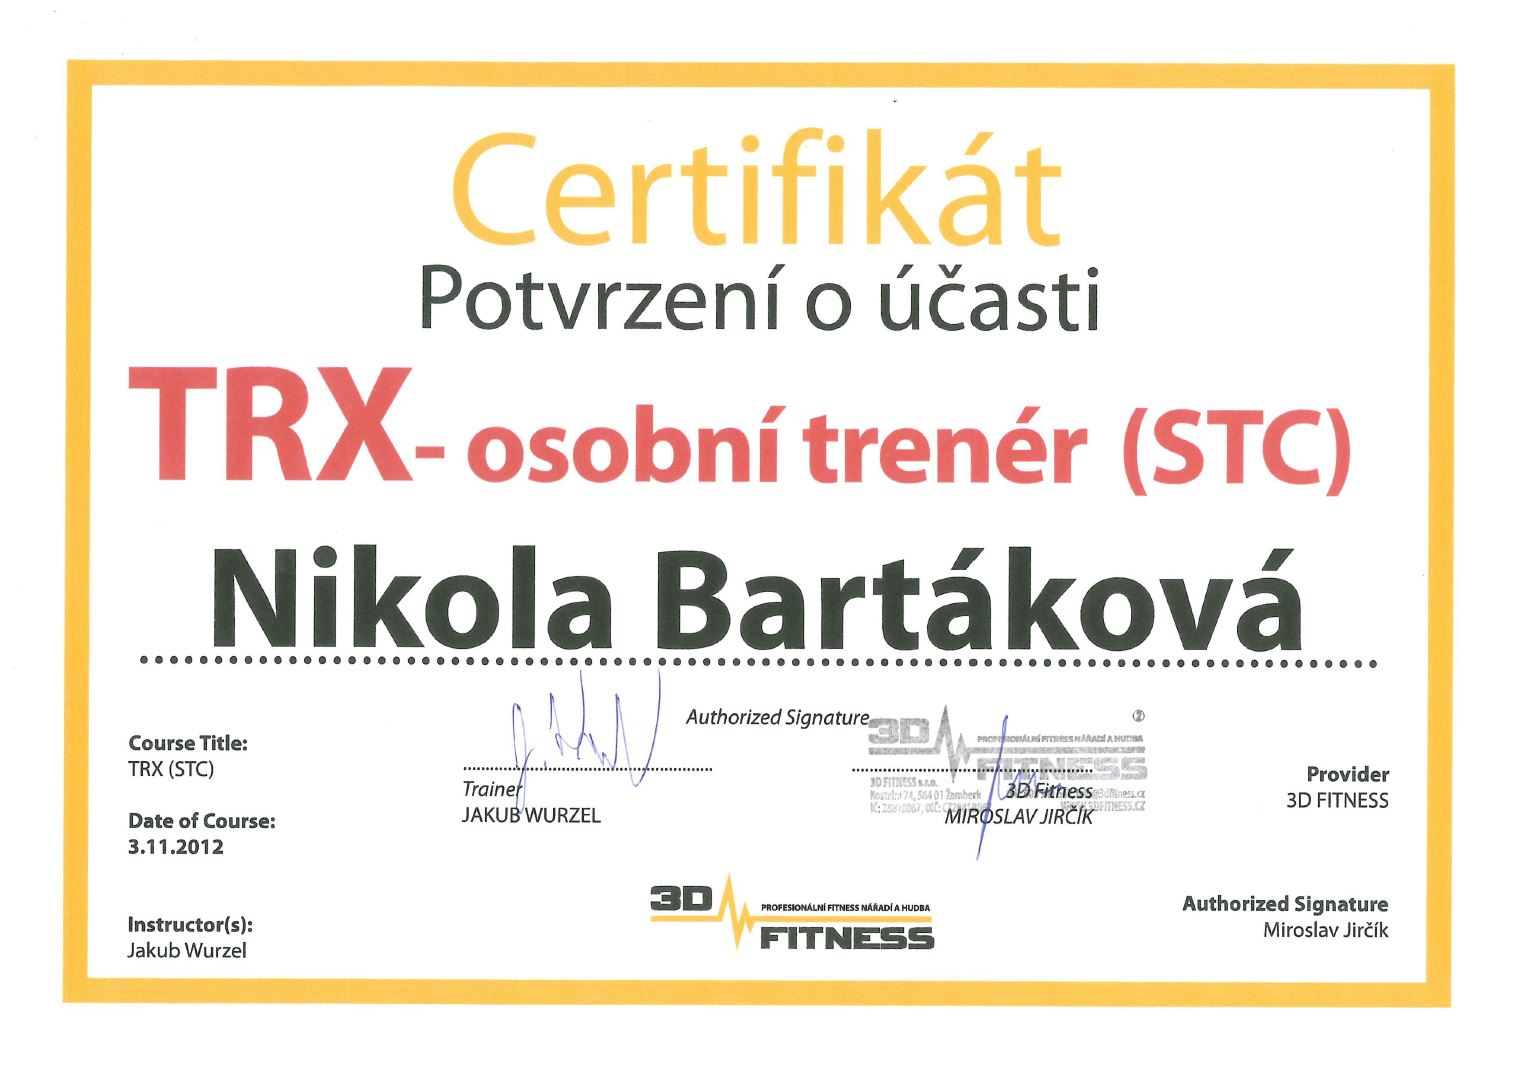 certifikat trx 2012